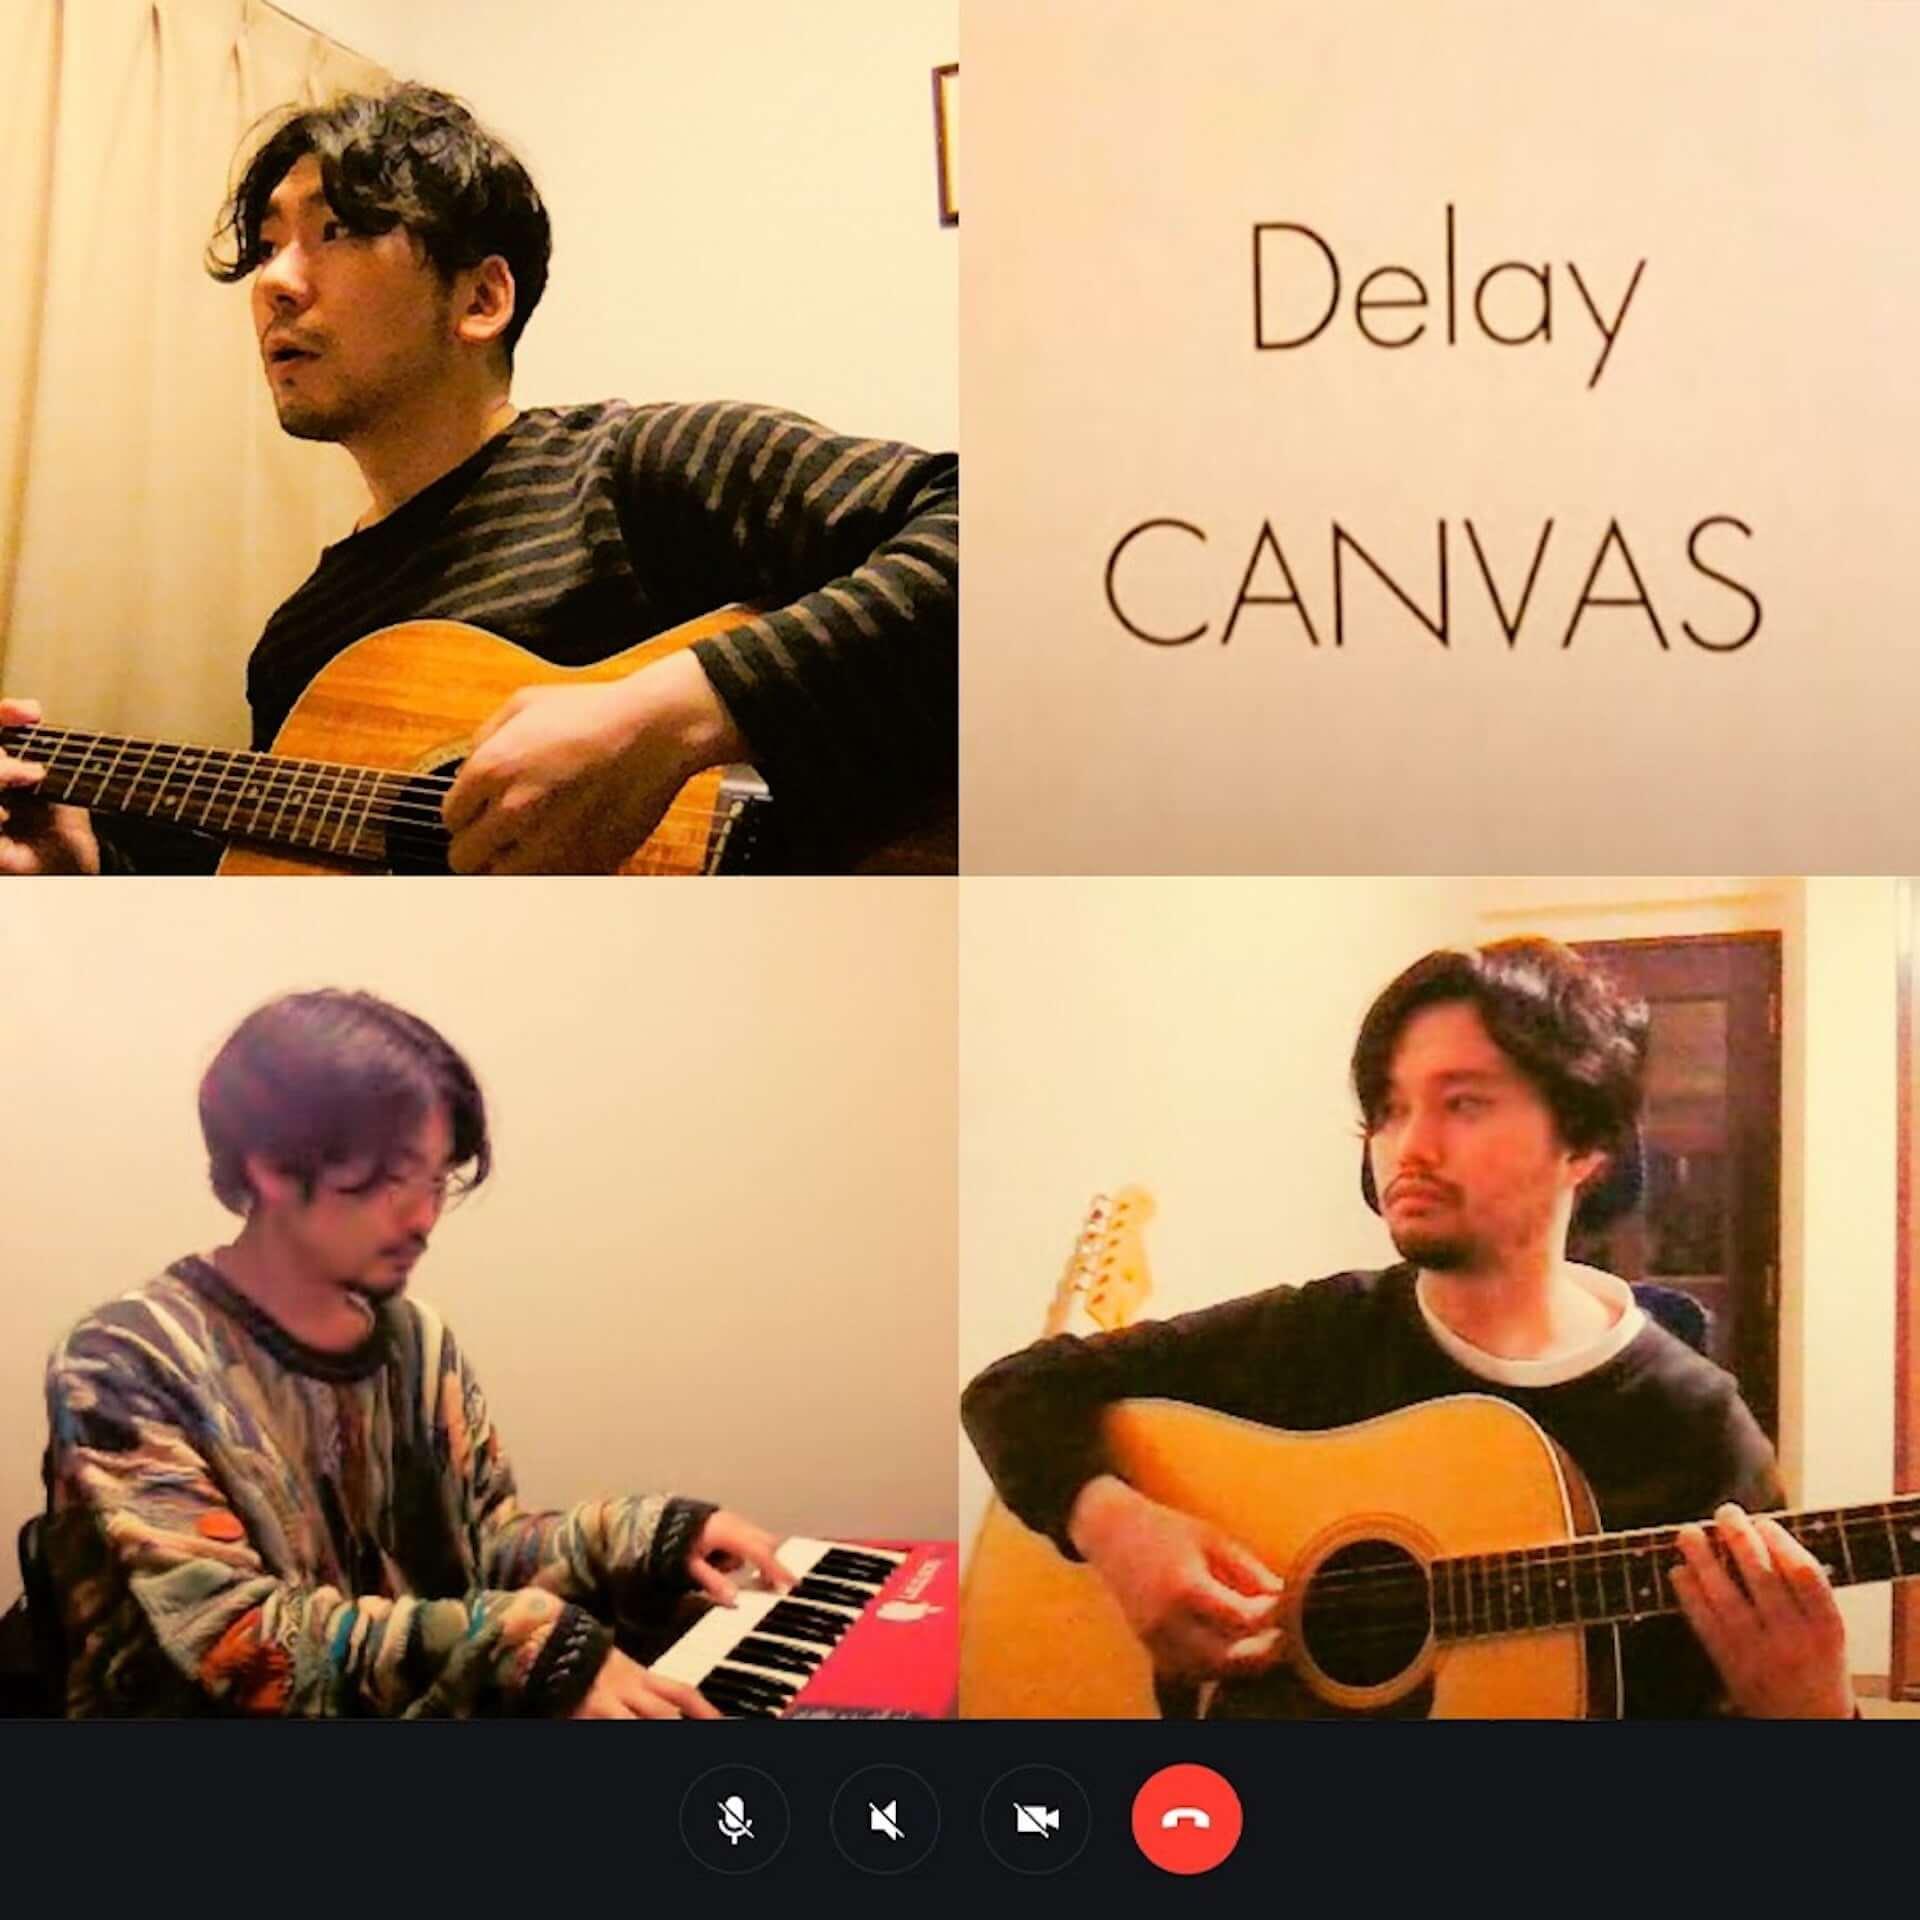 OTOTOYの施設支援企画「Save Our Place」第4弾音源として8作品が配信開始 高野寛の未発表音源集や田中光参加のコンピも music200423_saveourplace_4-1920x1920